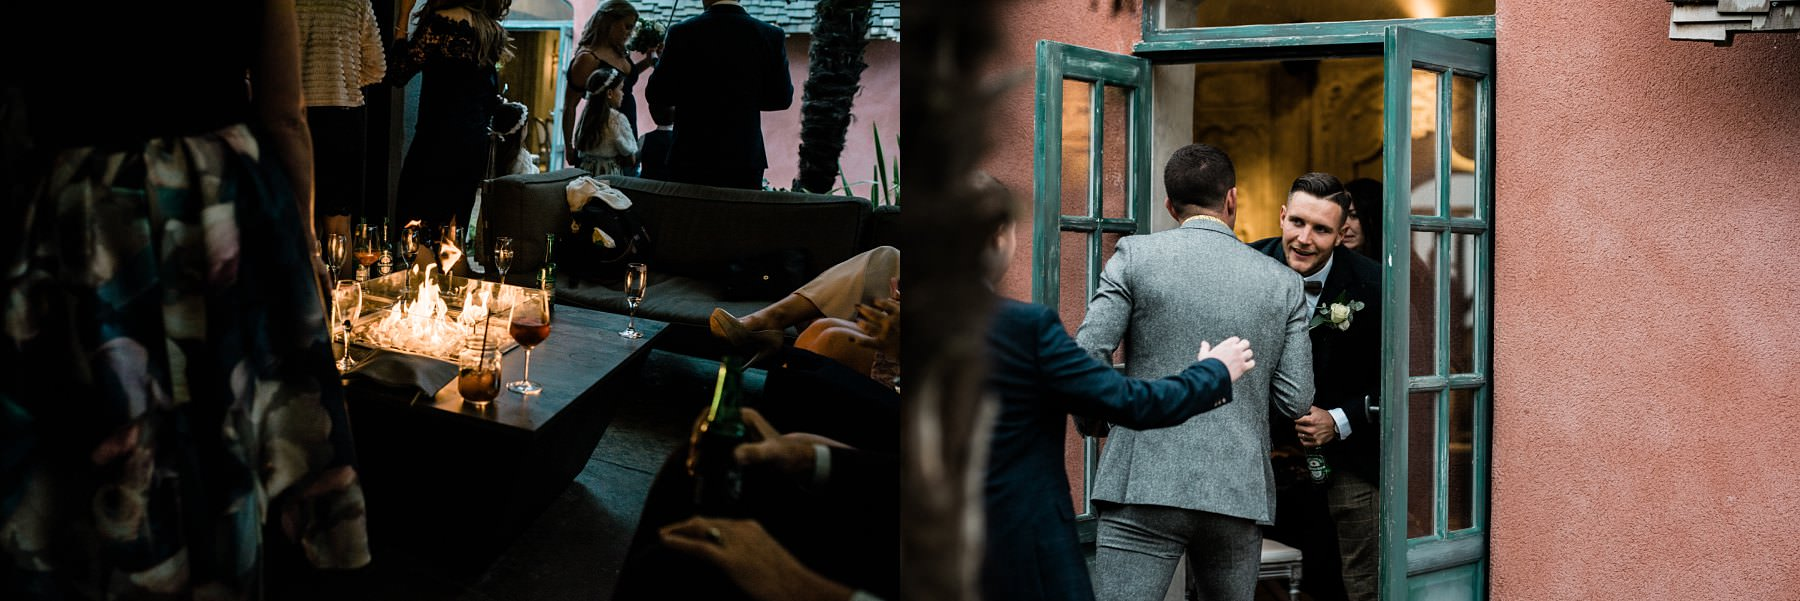 Wedding reception Le petite Chateau wedding - Newcastle Wedding Photographer